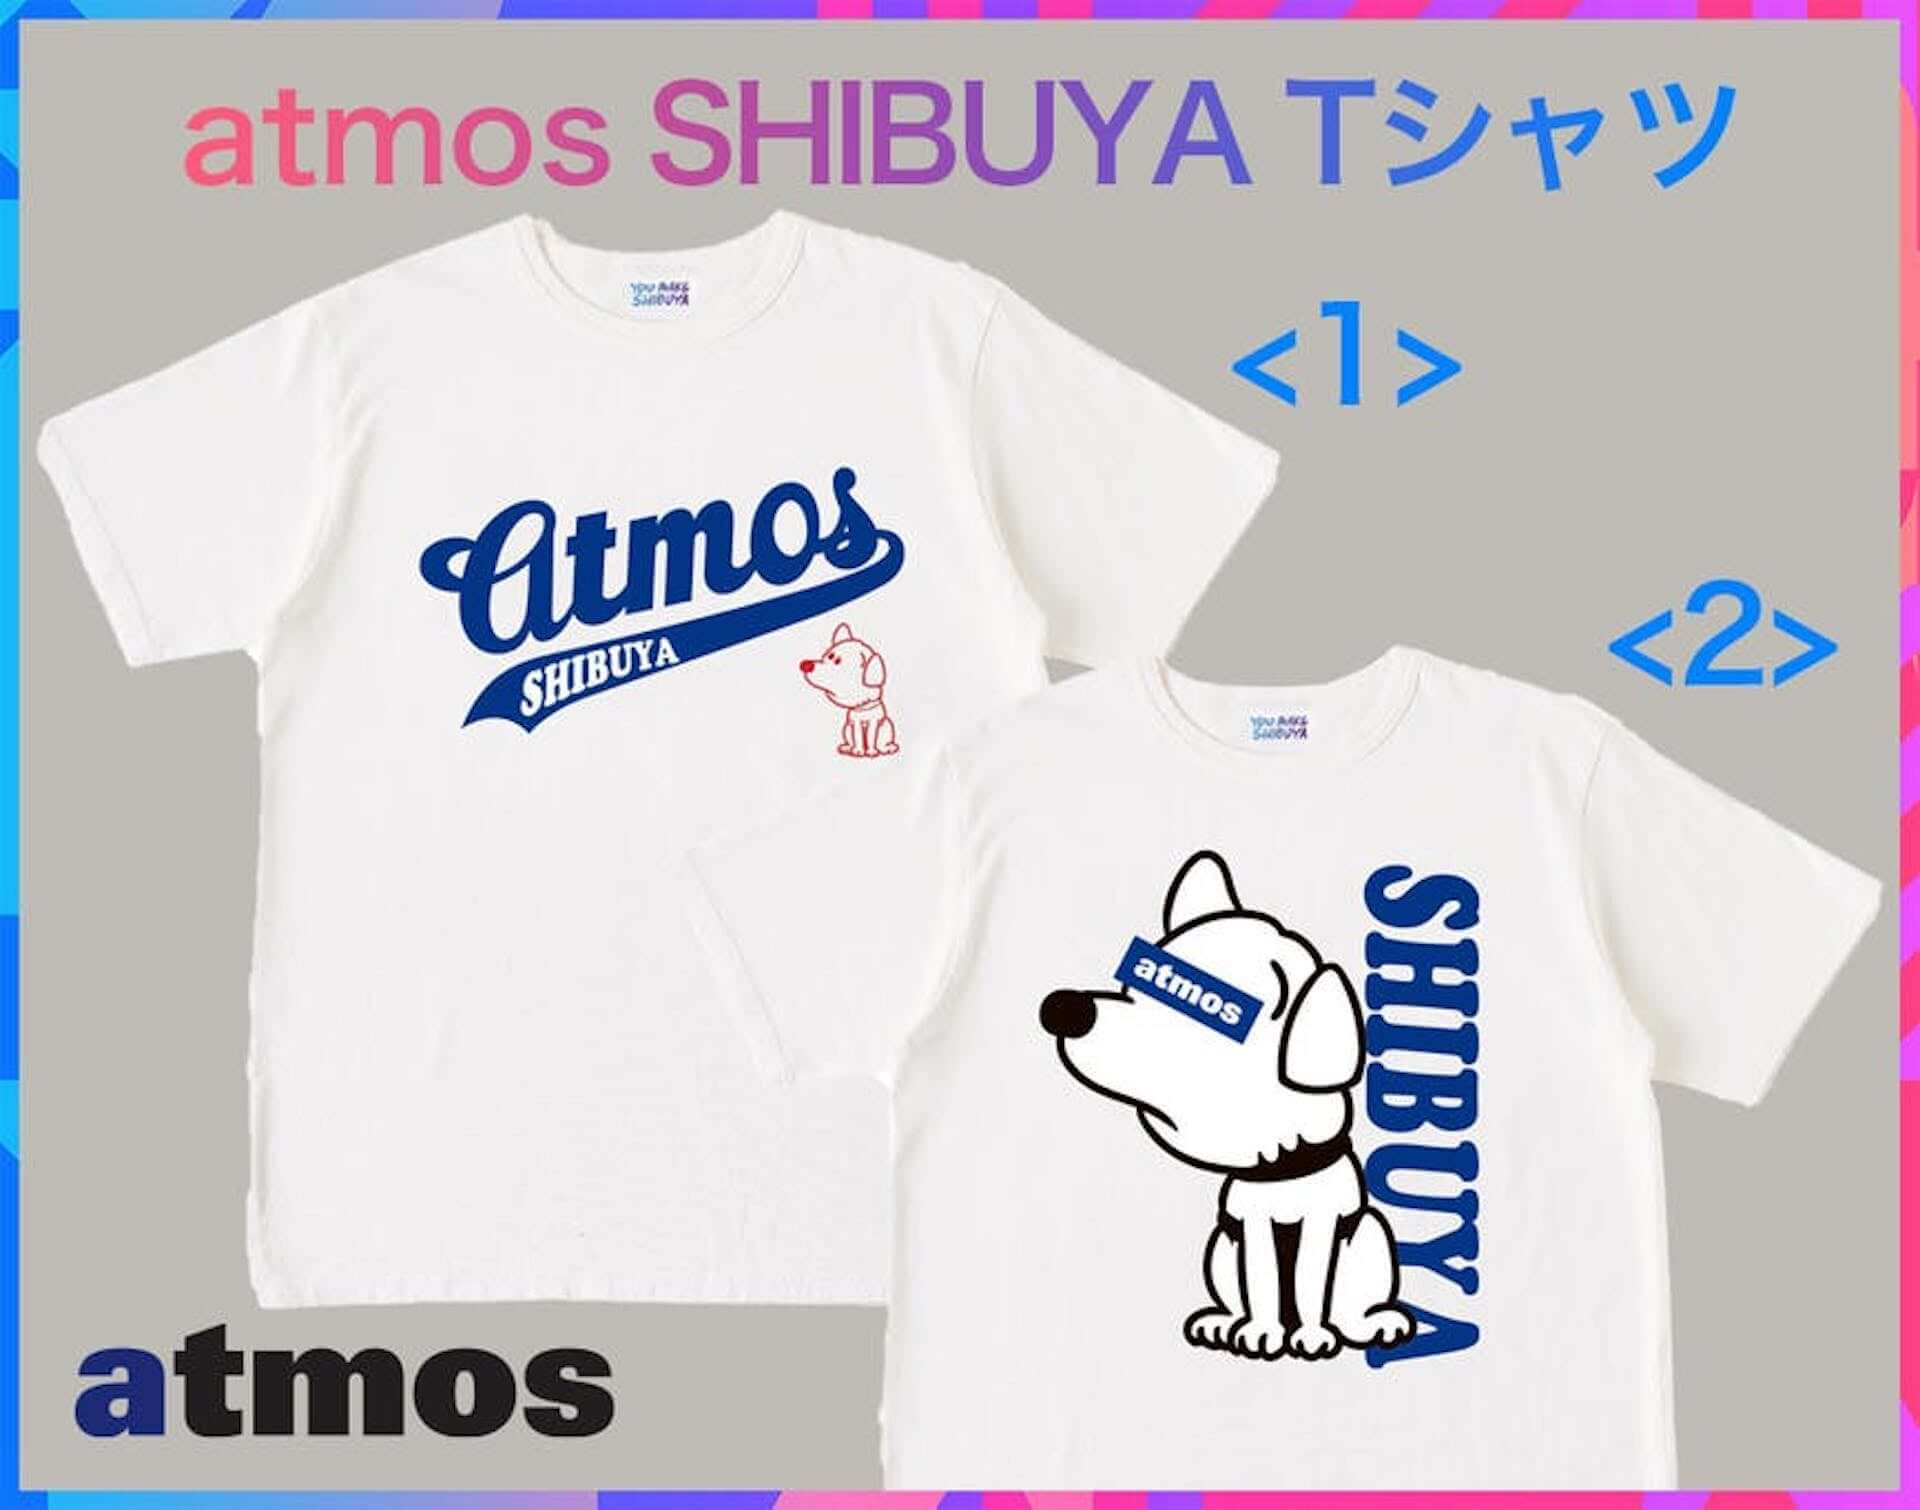 「YOU MAKE SHIBUYA クラウドファンディング」とKISS,TOKYO、atmos、EQUALAND、FR2がコラボ!リターンにTシャツ、フーディーなど多数登場 lf200805_youmakeshibuya_9-1920x1510